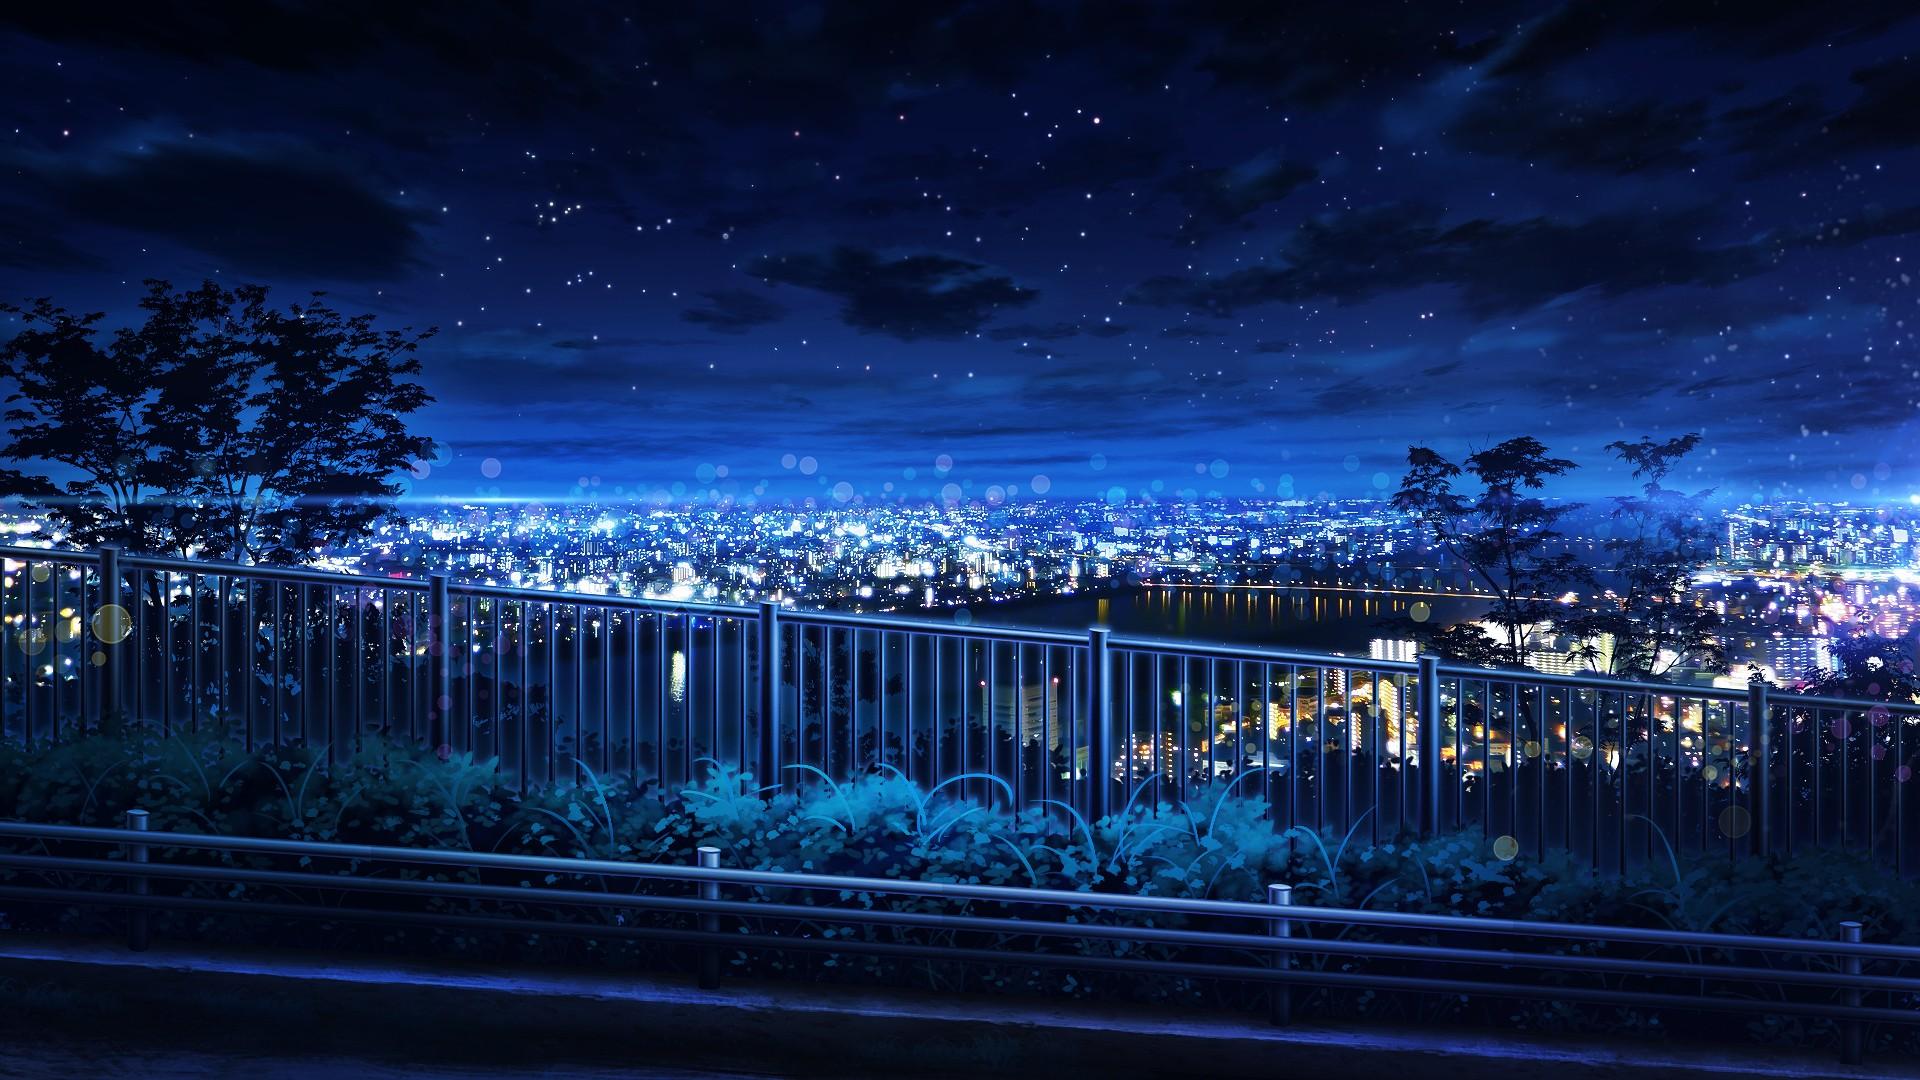 Cityscape Night 1920x1080